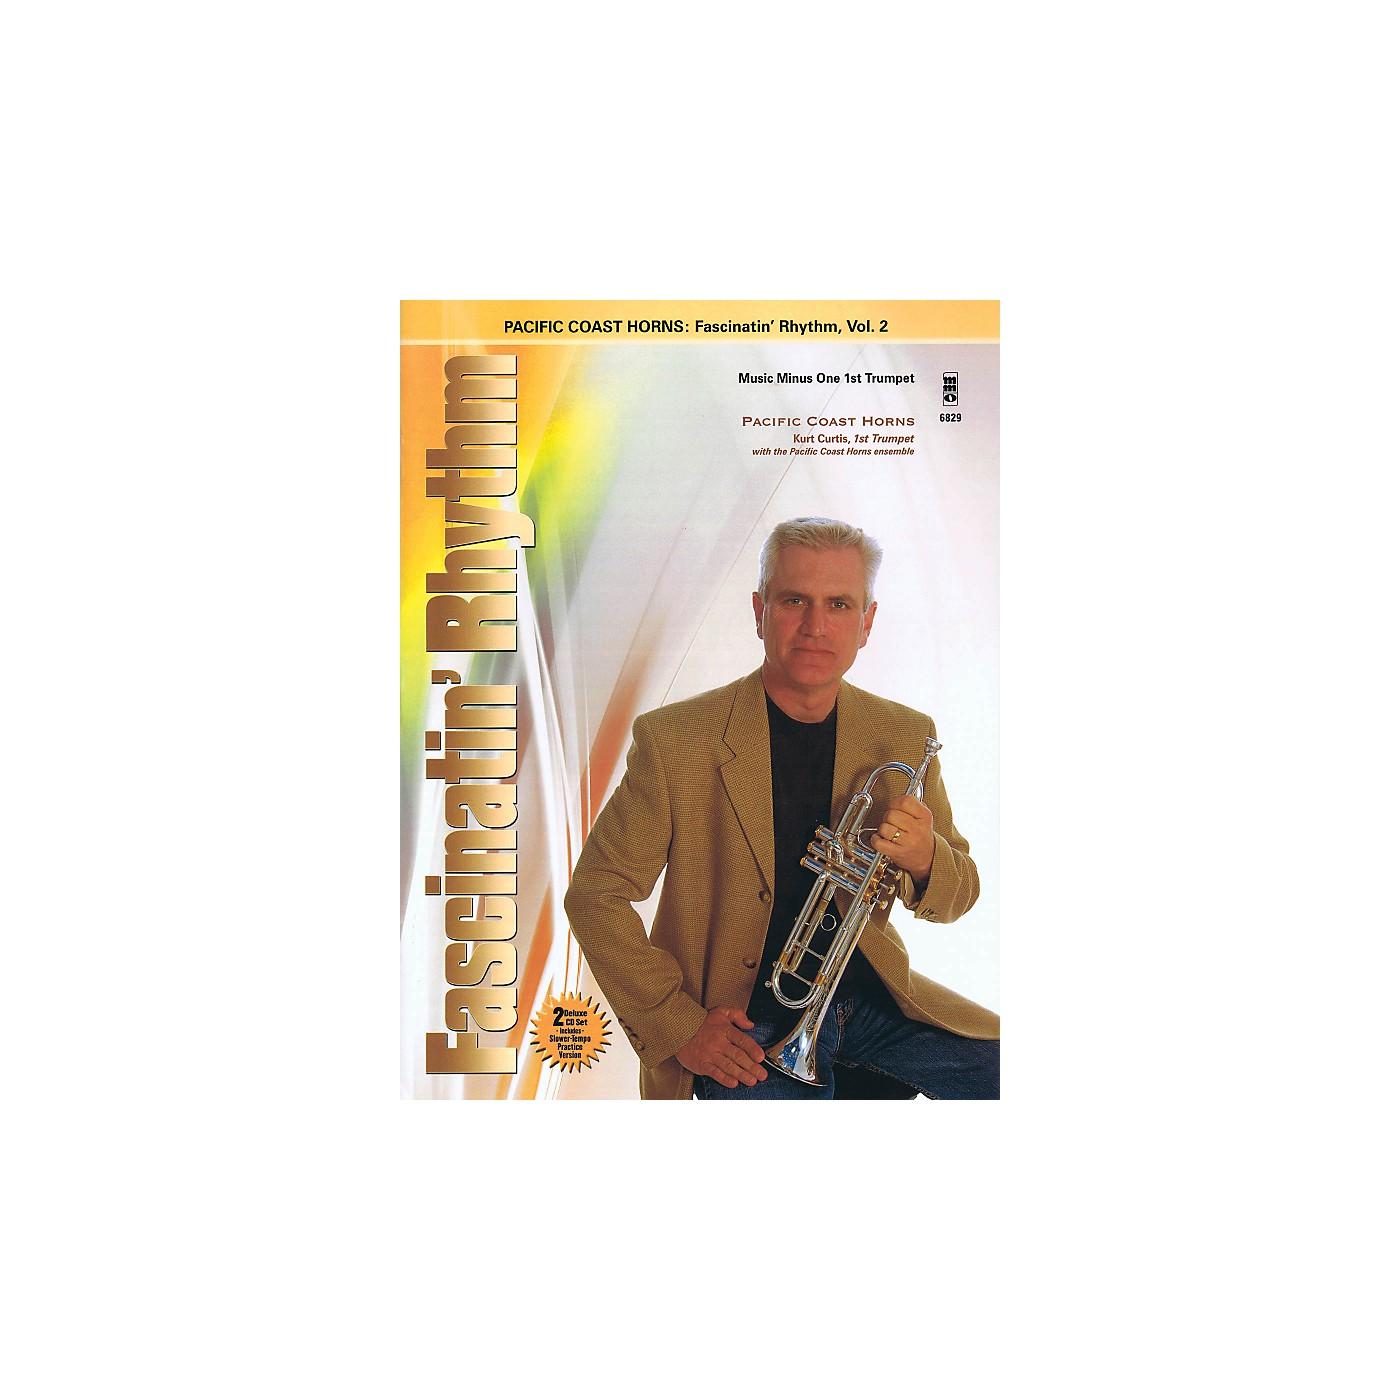 Hal Leonard Pacific Coast Horns - Fascinatin' Rhythm Vol. 2 for Trumpet Book/2CD thumbnail